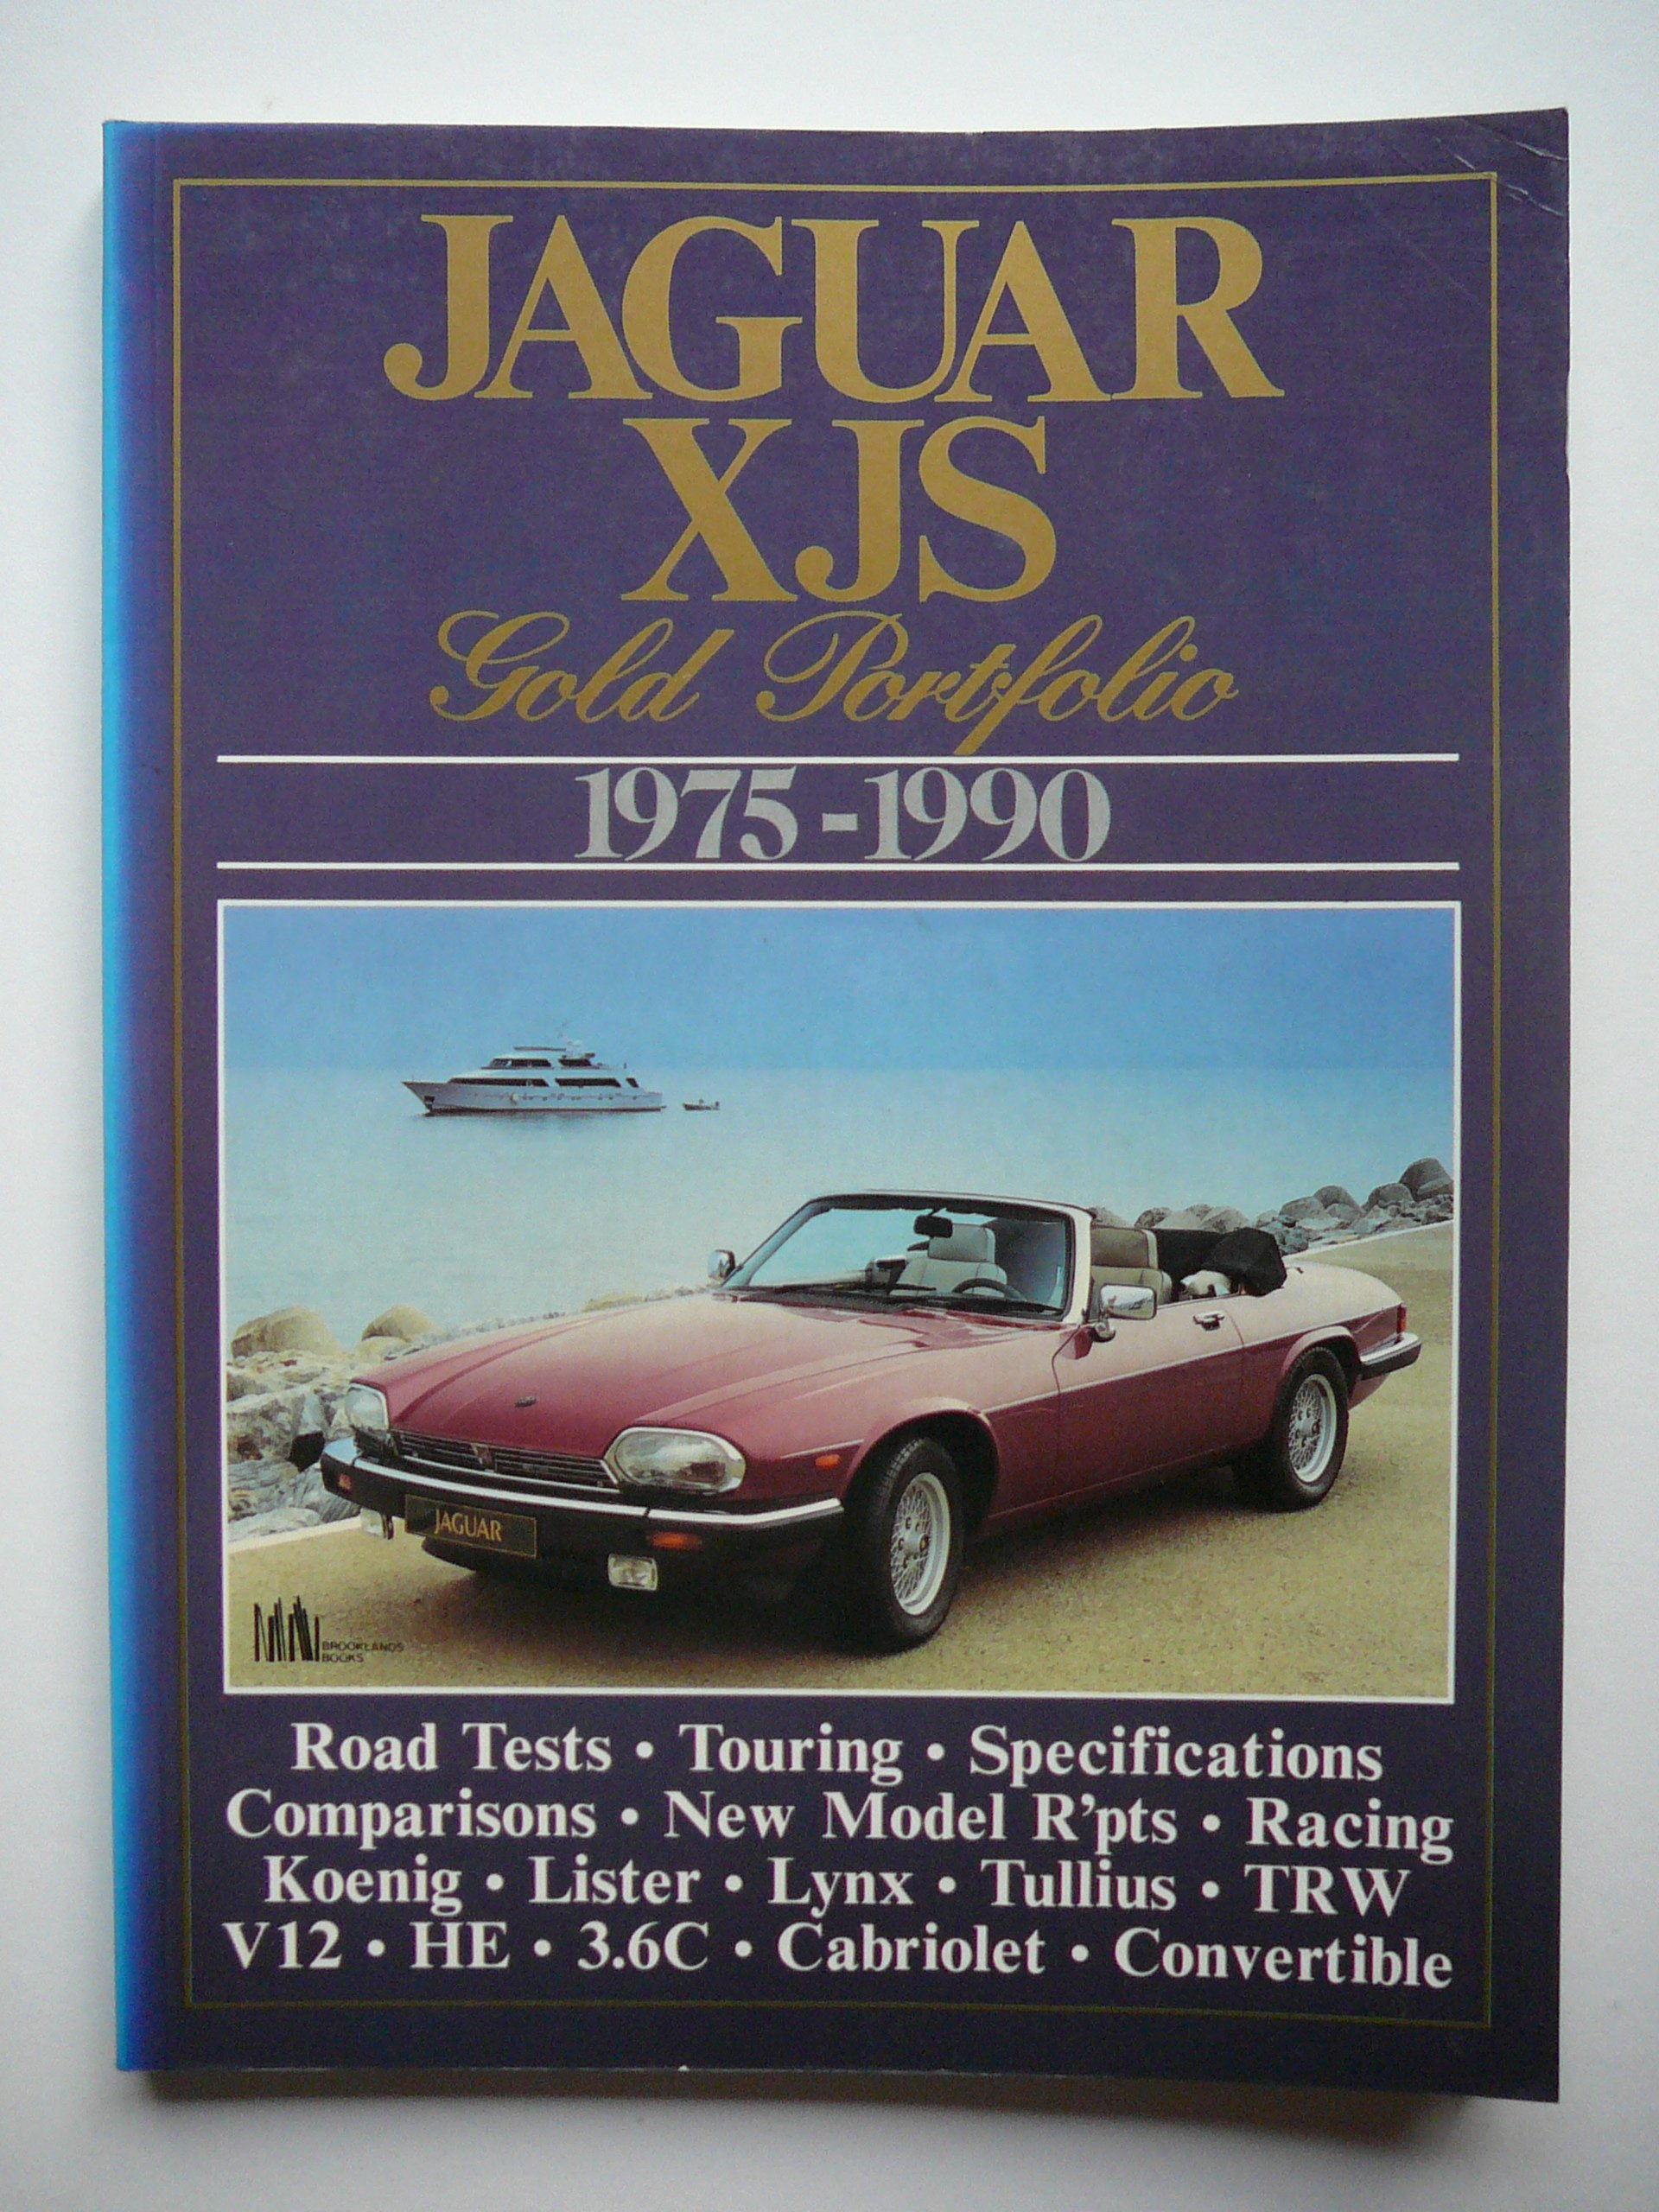 Jaguar XJS Gold Portfolio, 1975-90 (Brooklands Books Road Tests Series)